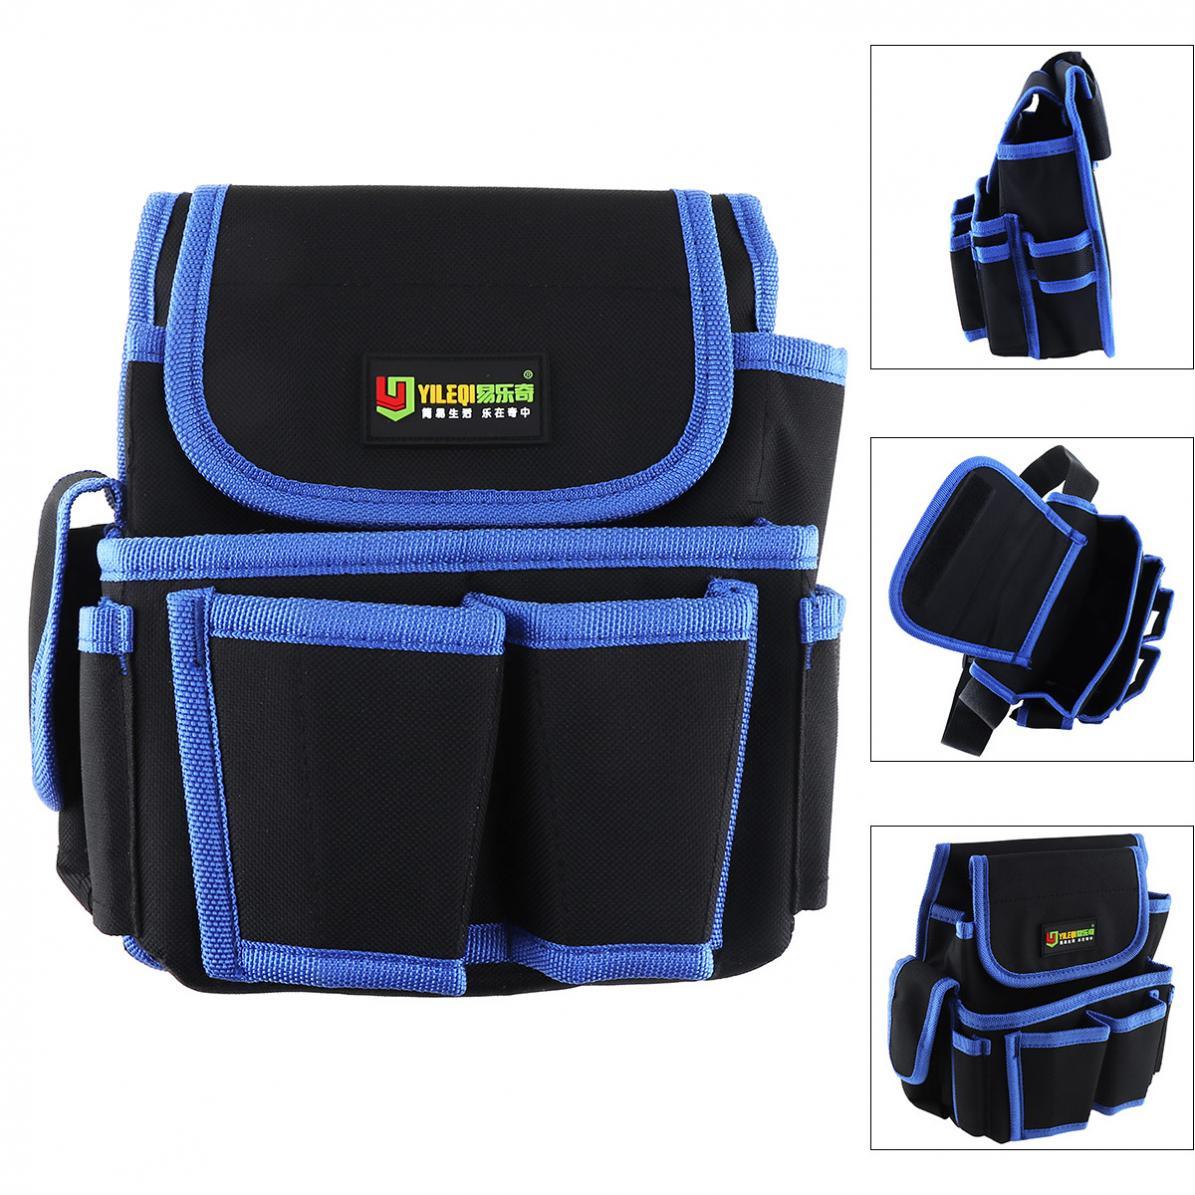 Multifunctional Package Waterproof Waist Tool Bag Durable Package With 4 Holes 2 Pocket For Home / Industrial Maintenance